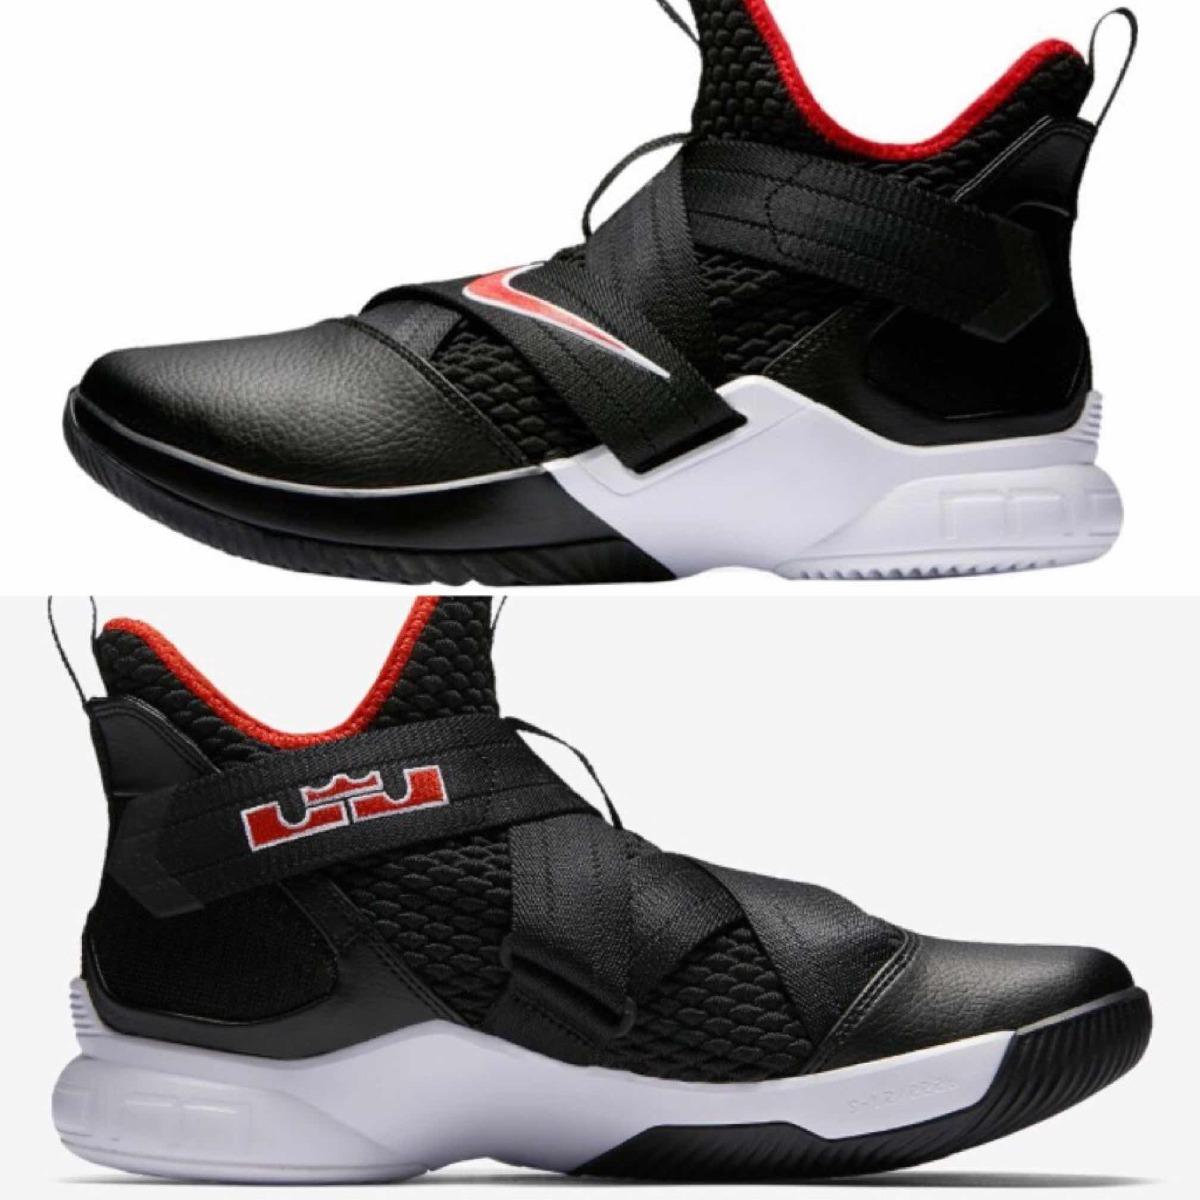 buy popular 1f72f 7f5ed Tenis Nike Lebron Soldier Xii #25 Al 31 Cm (100% Originales)